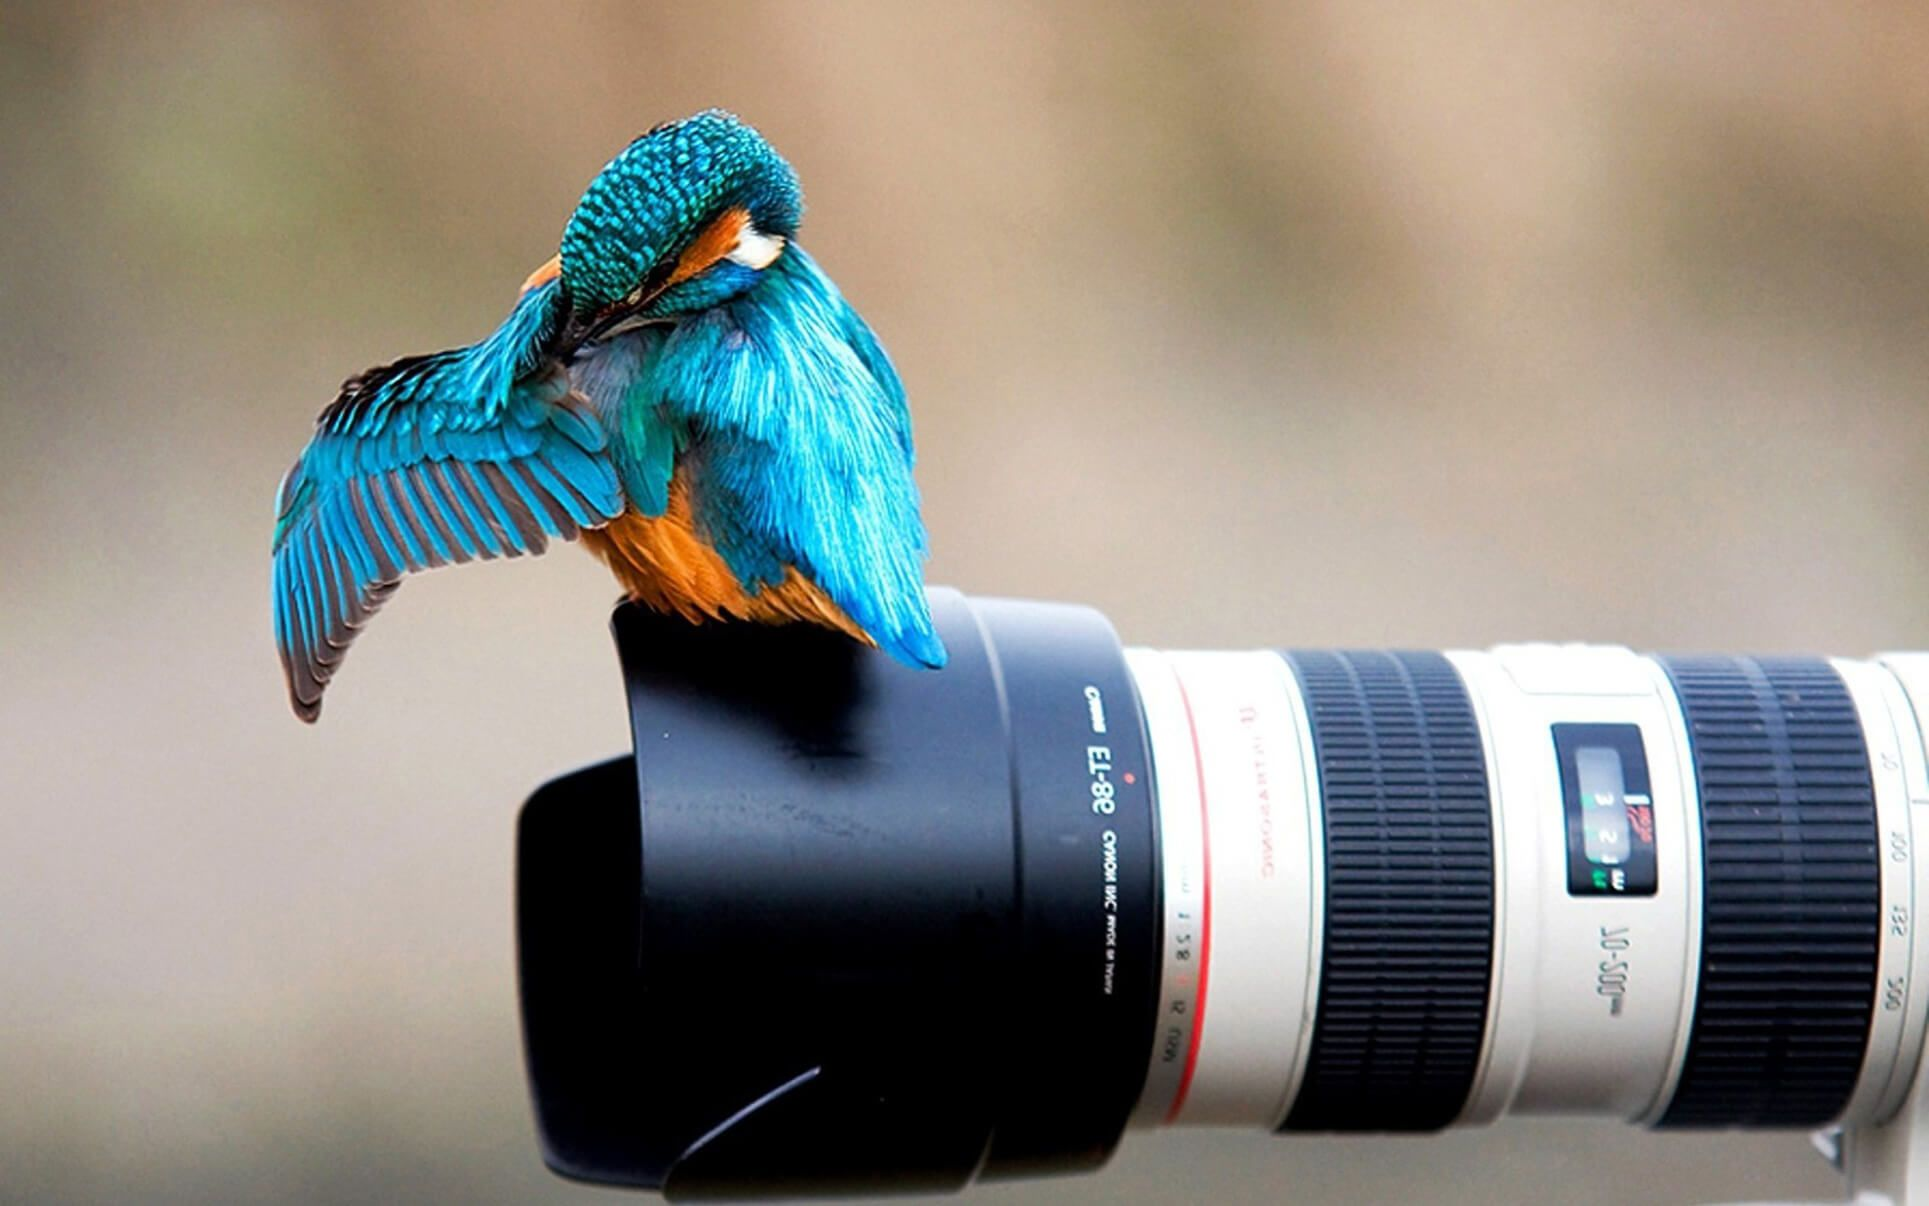 Canon Camera Photography Wallpaper Hd Camera Wallpaper Canon Camera Photography Photography Camera